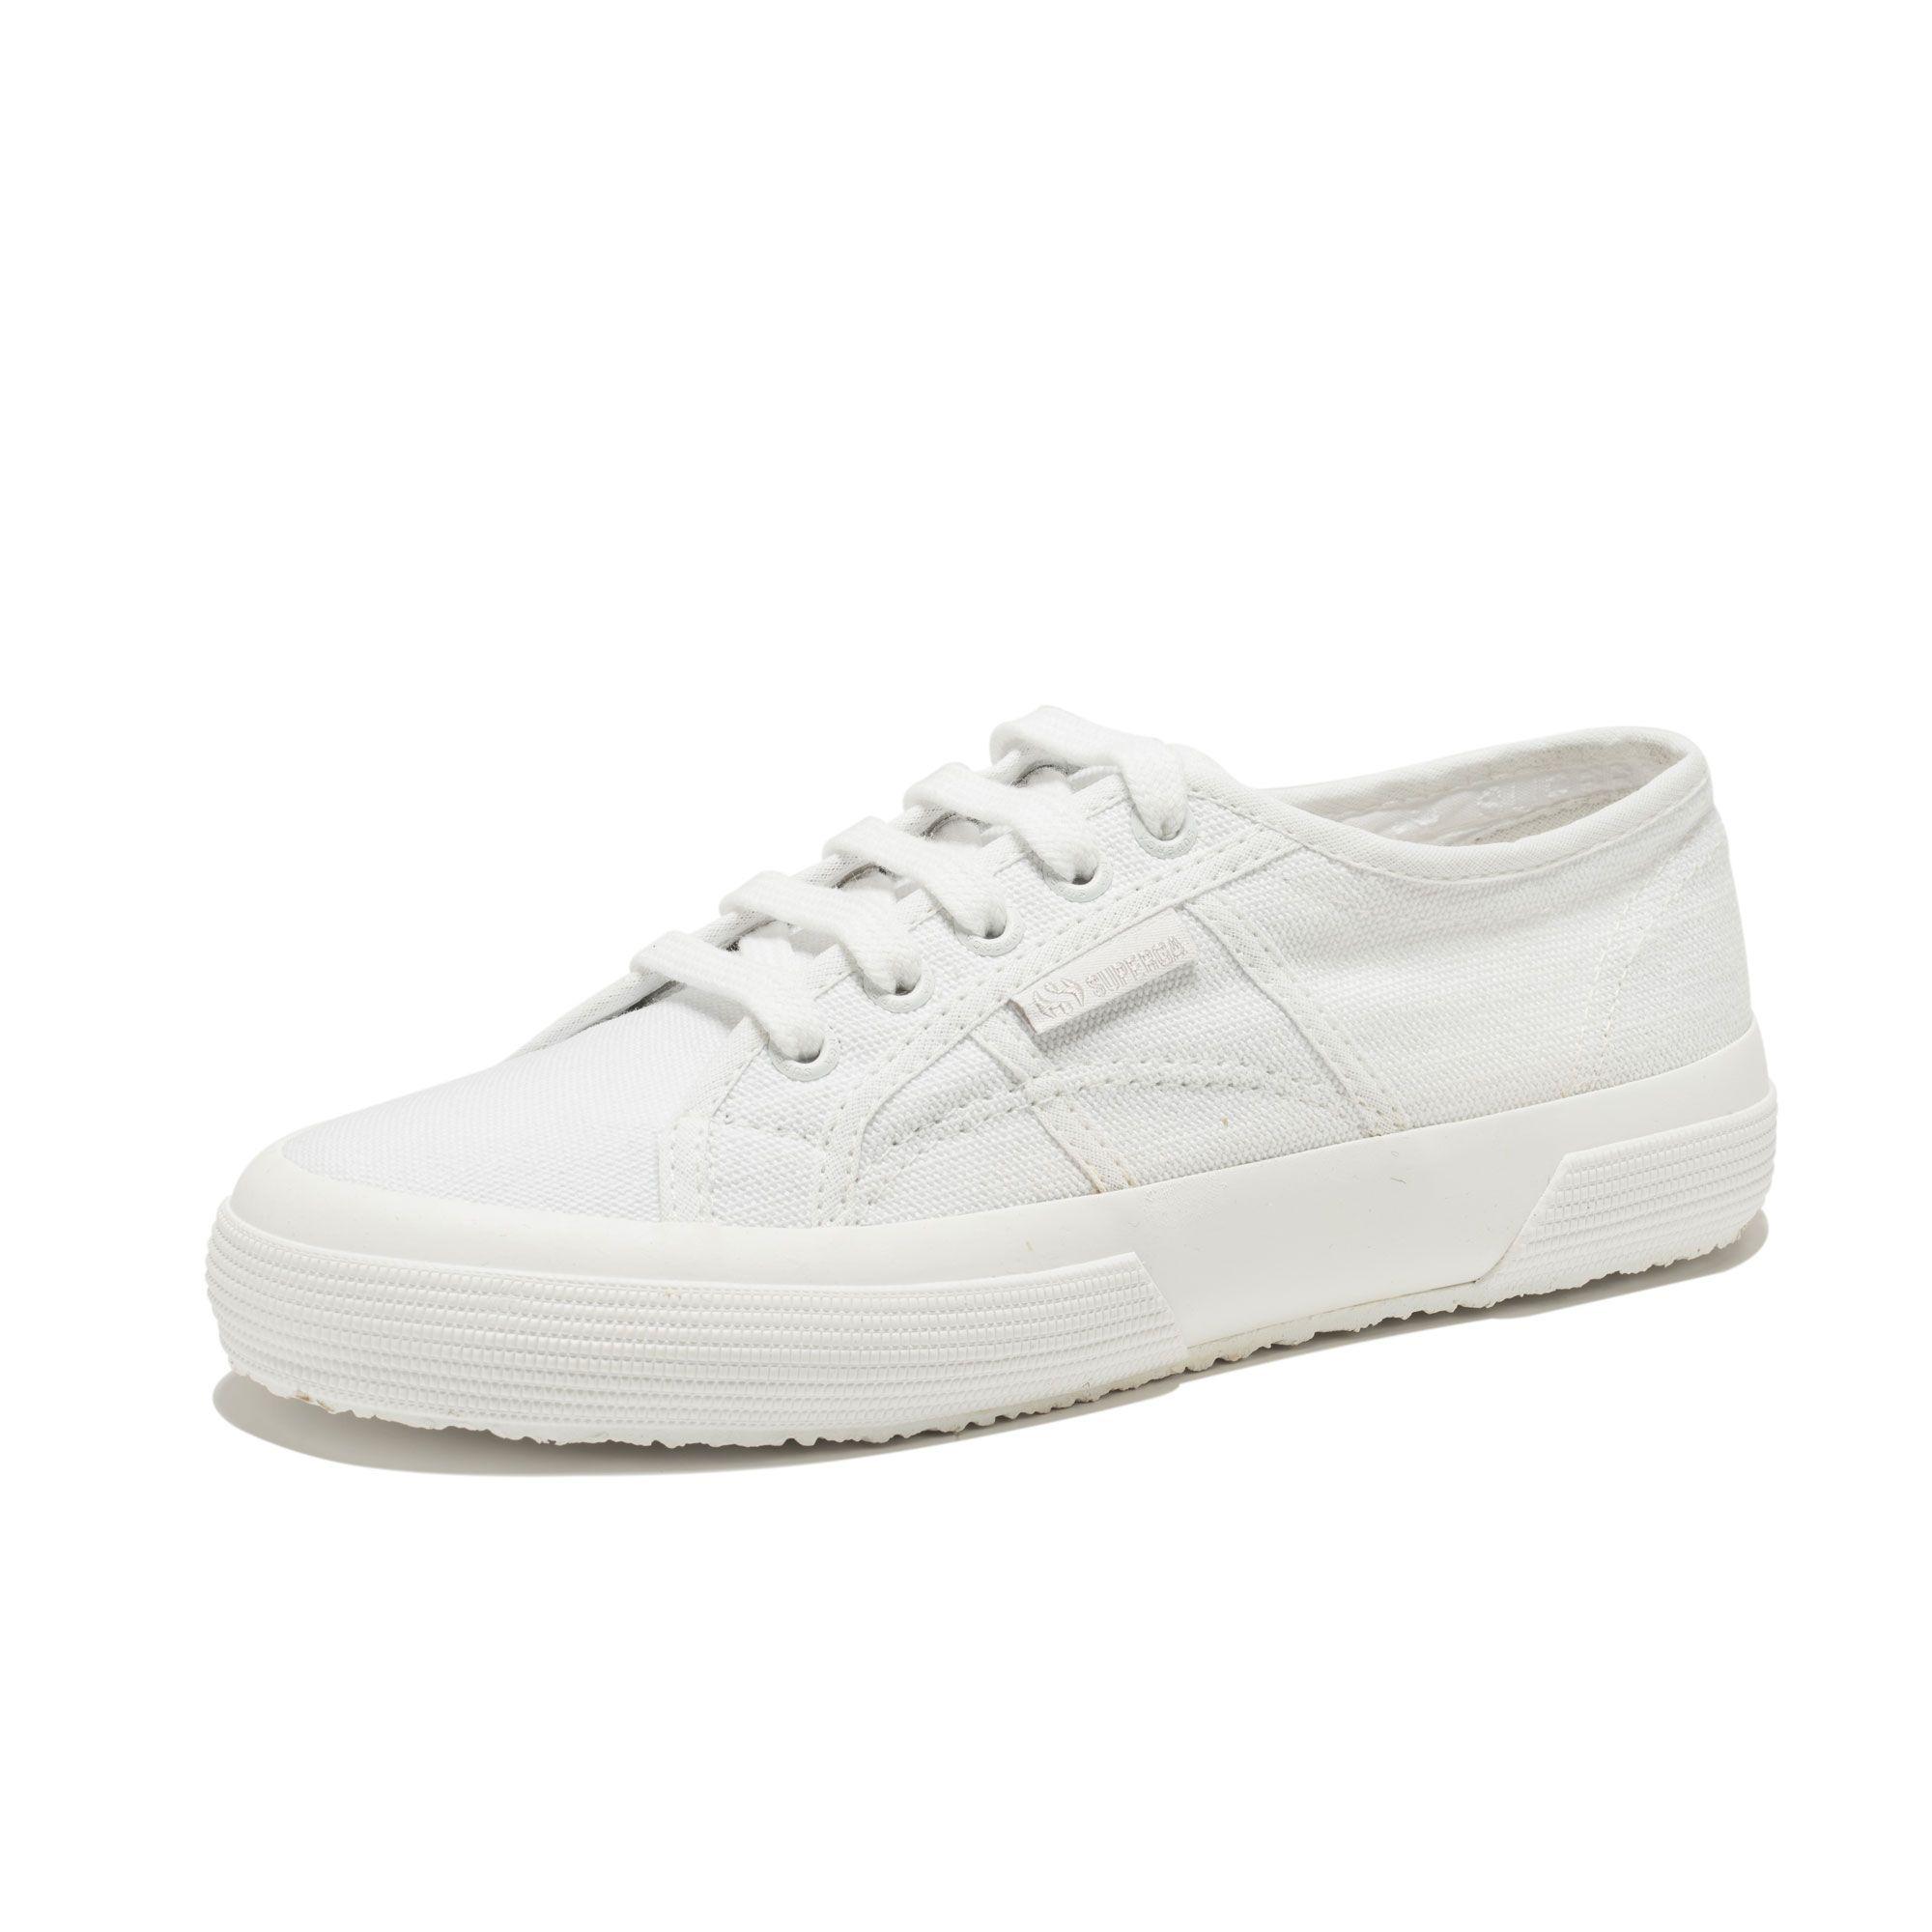 2750 COTU CLASSIC ALL WHITE